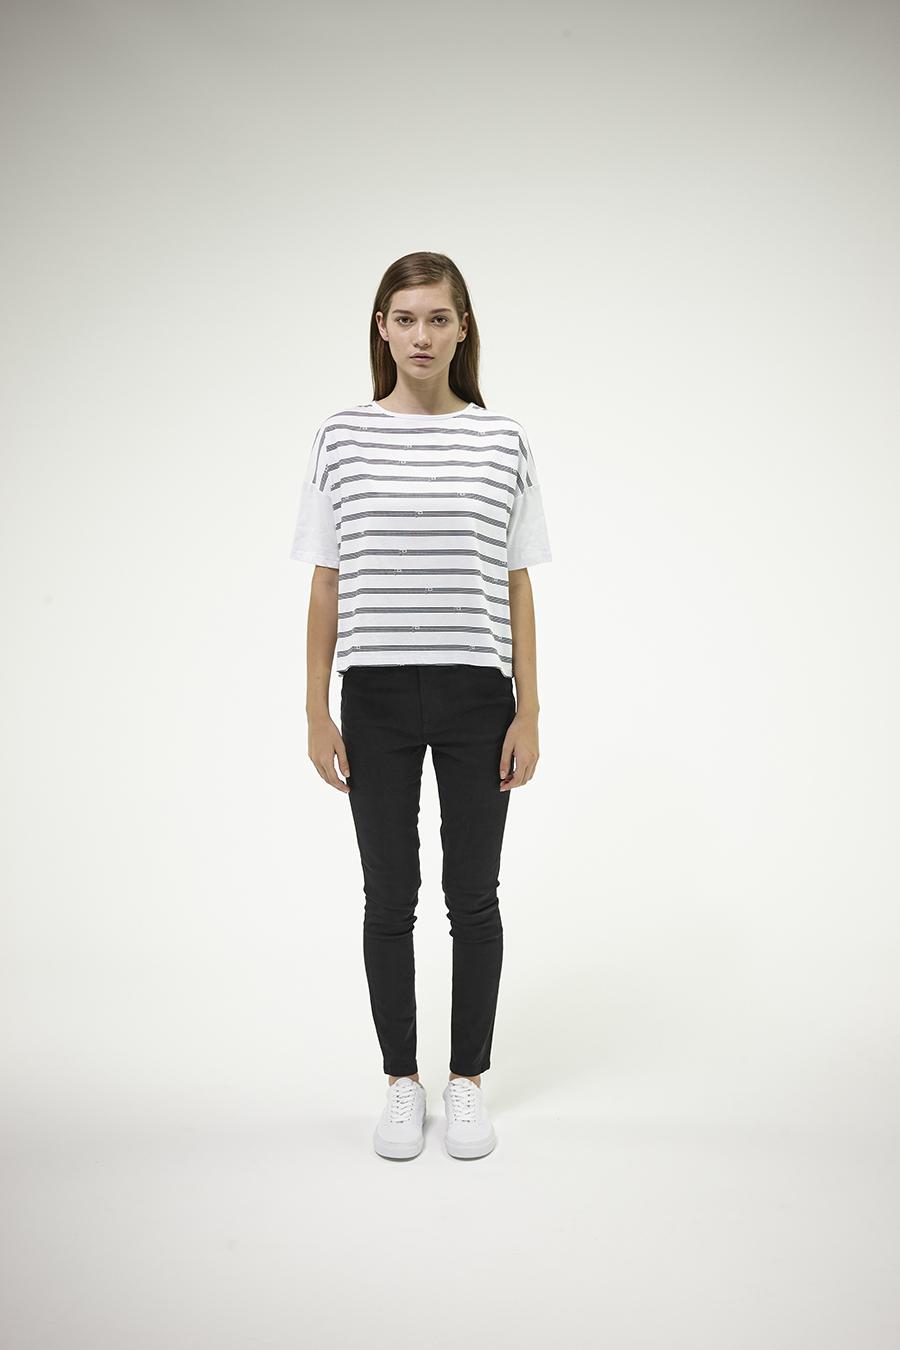 Huffer_Q1-16_W-Boaty-Flag-Stripe-Tee_White_001.jpg